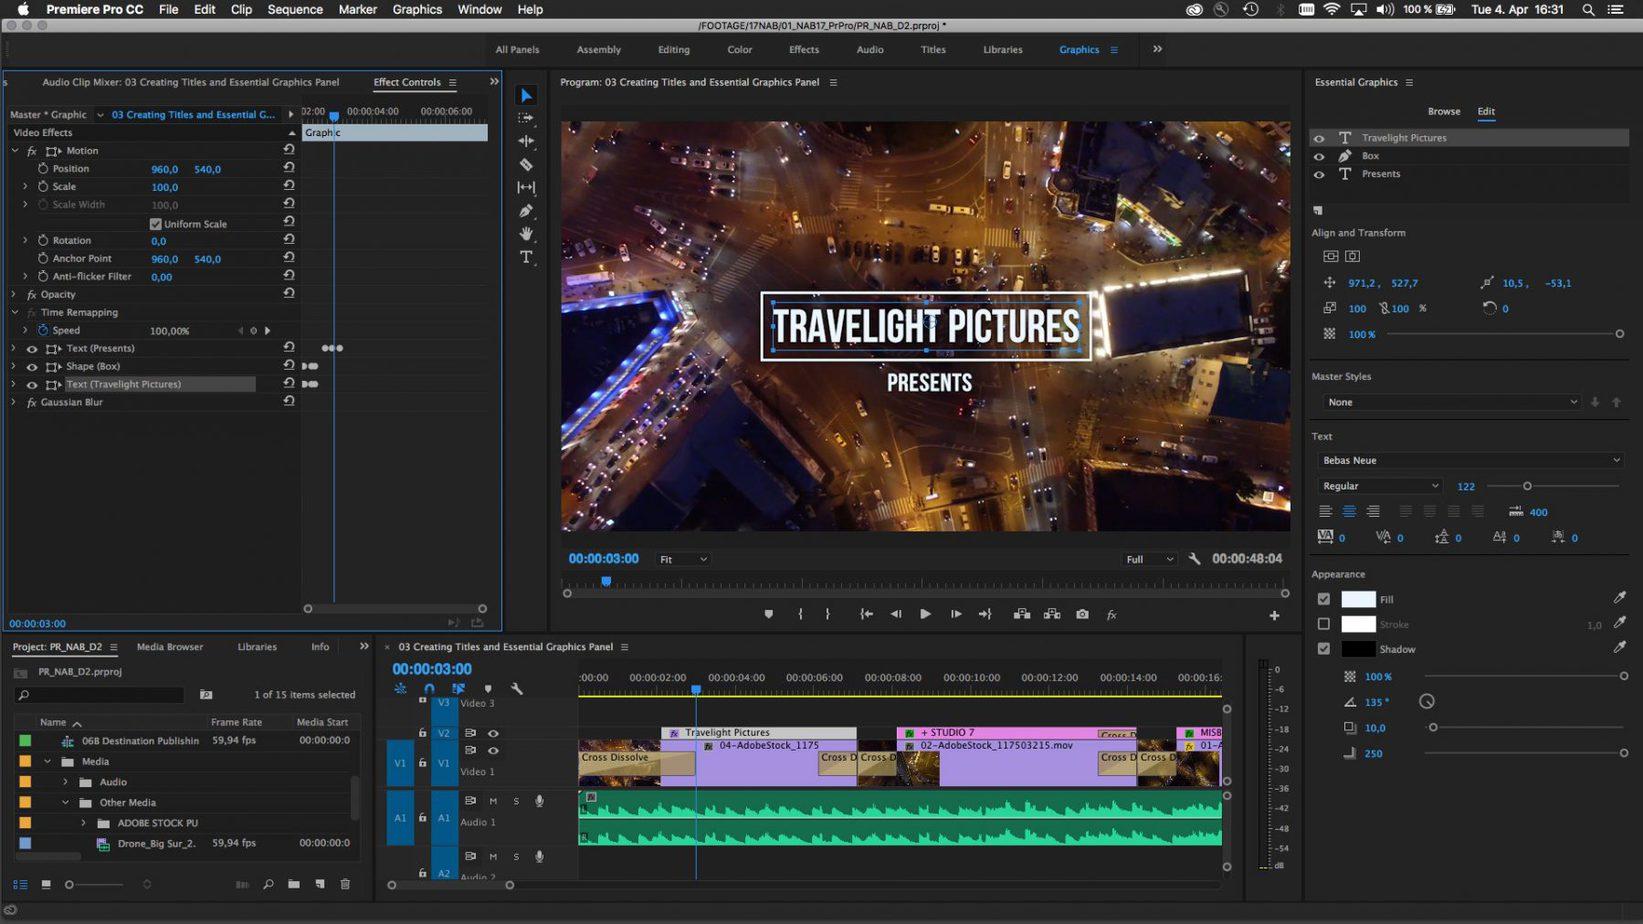 Adobe-Premiere-Pro-dashboard.jpg